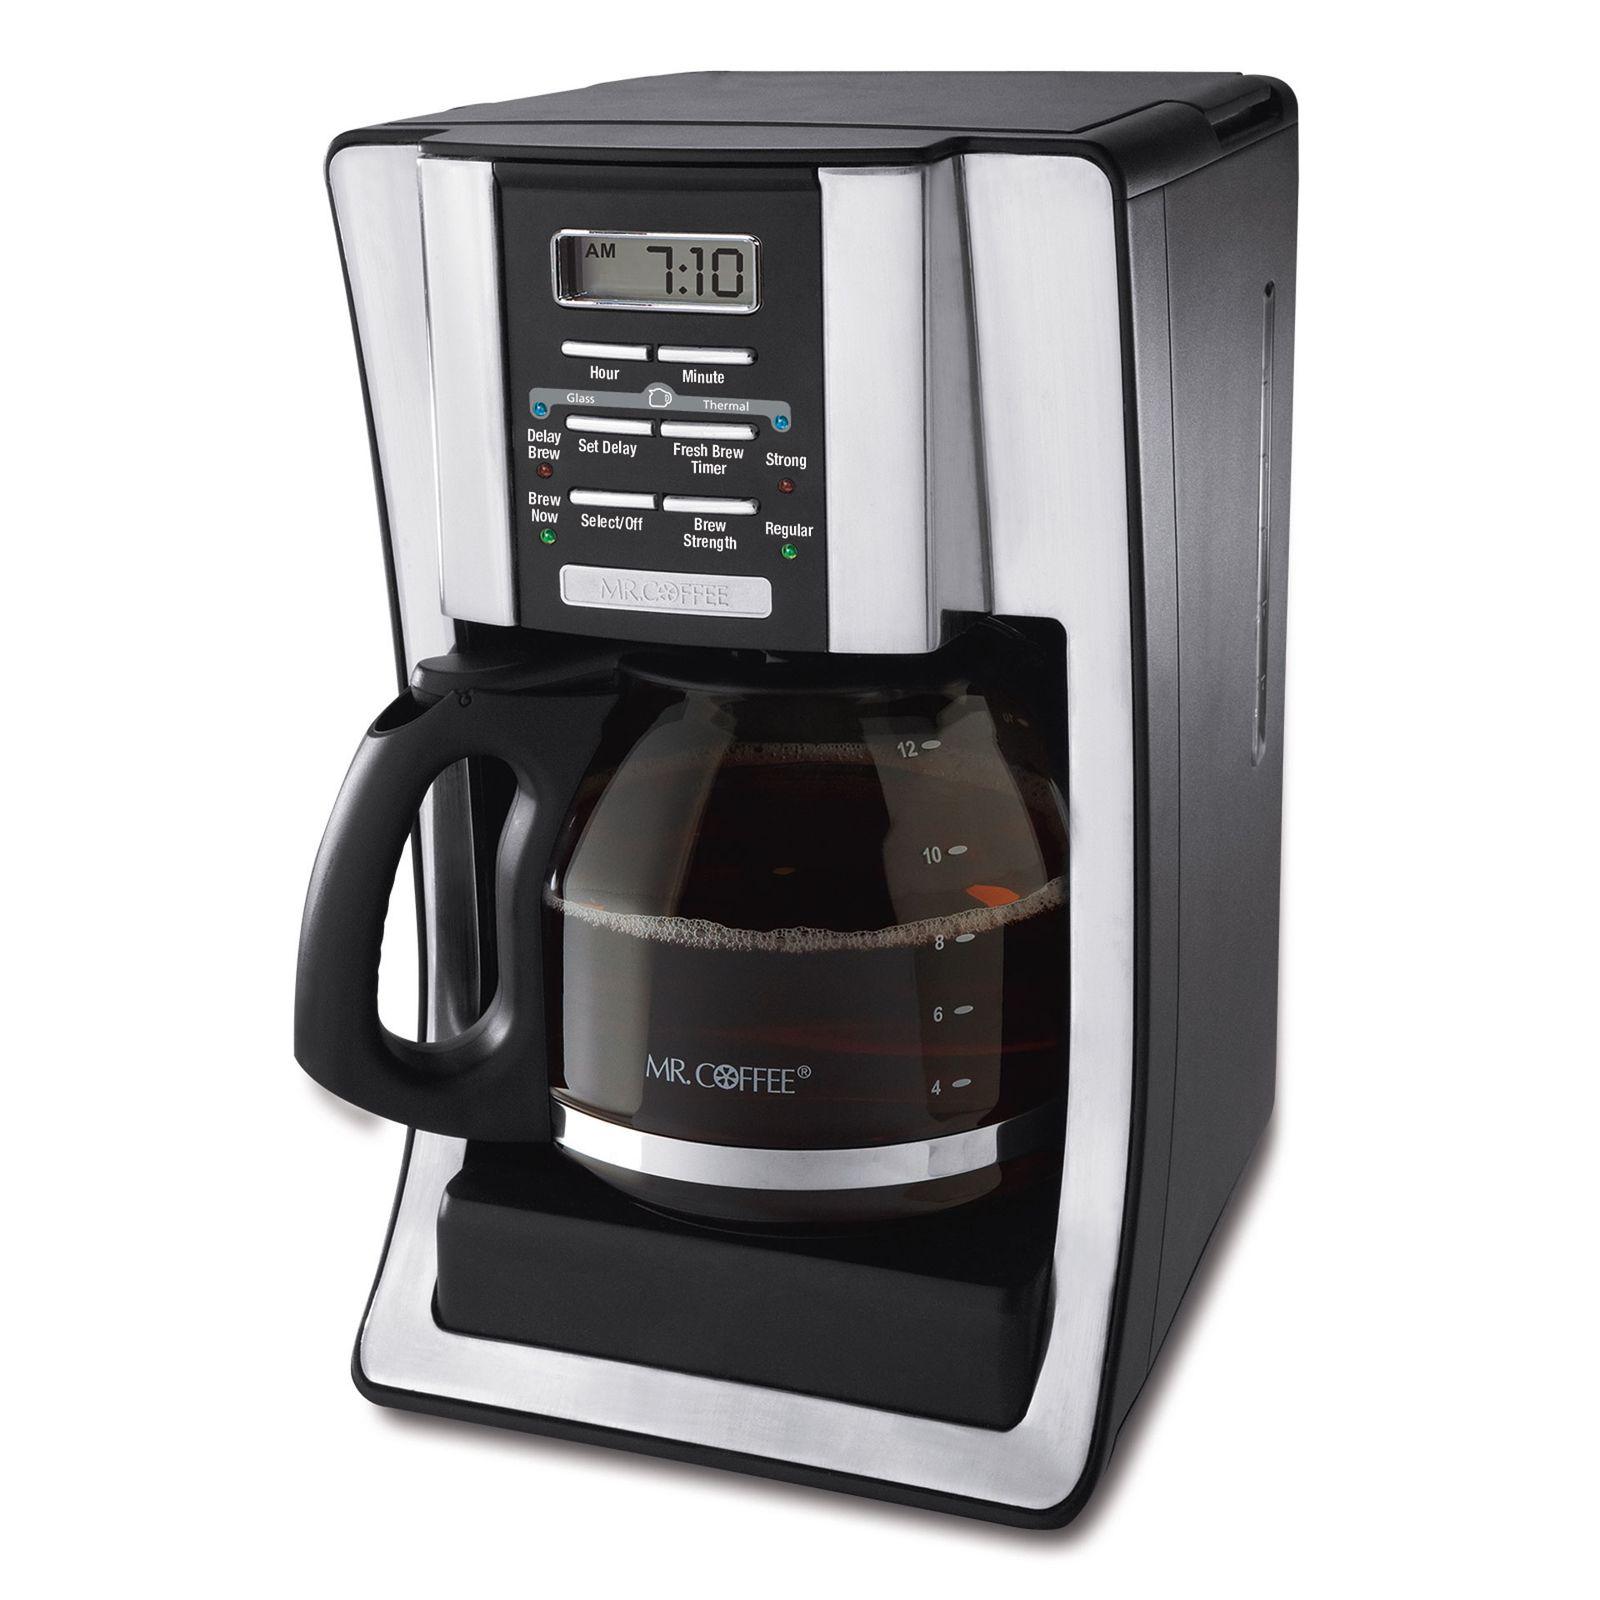 Mr. Coffee 12-Cup Programmable Coffeemaker #BVMC-SJX33GT Review